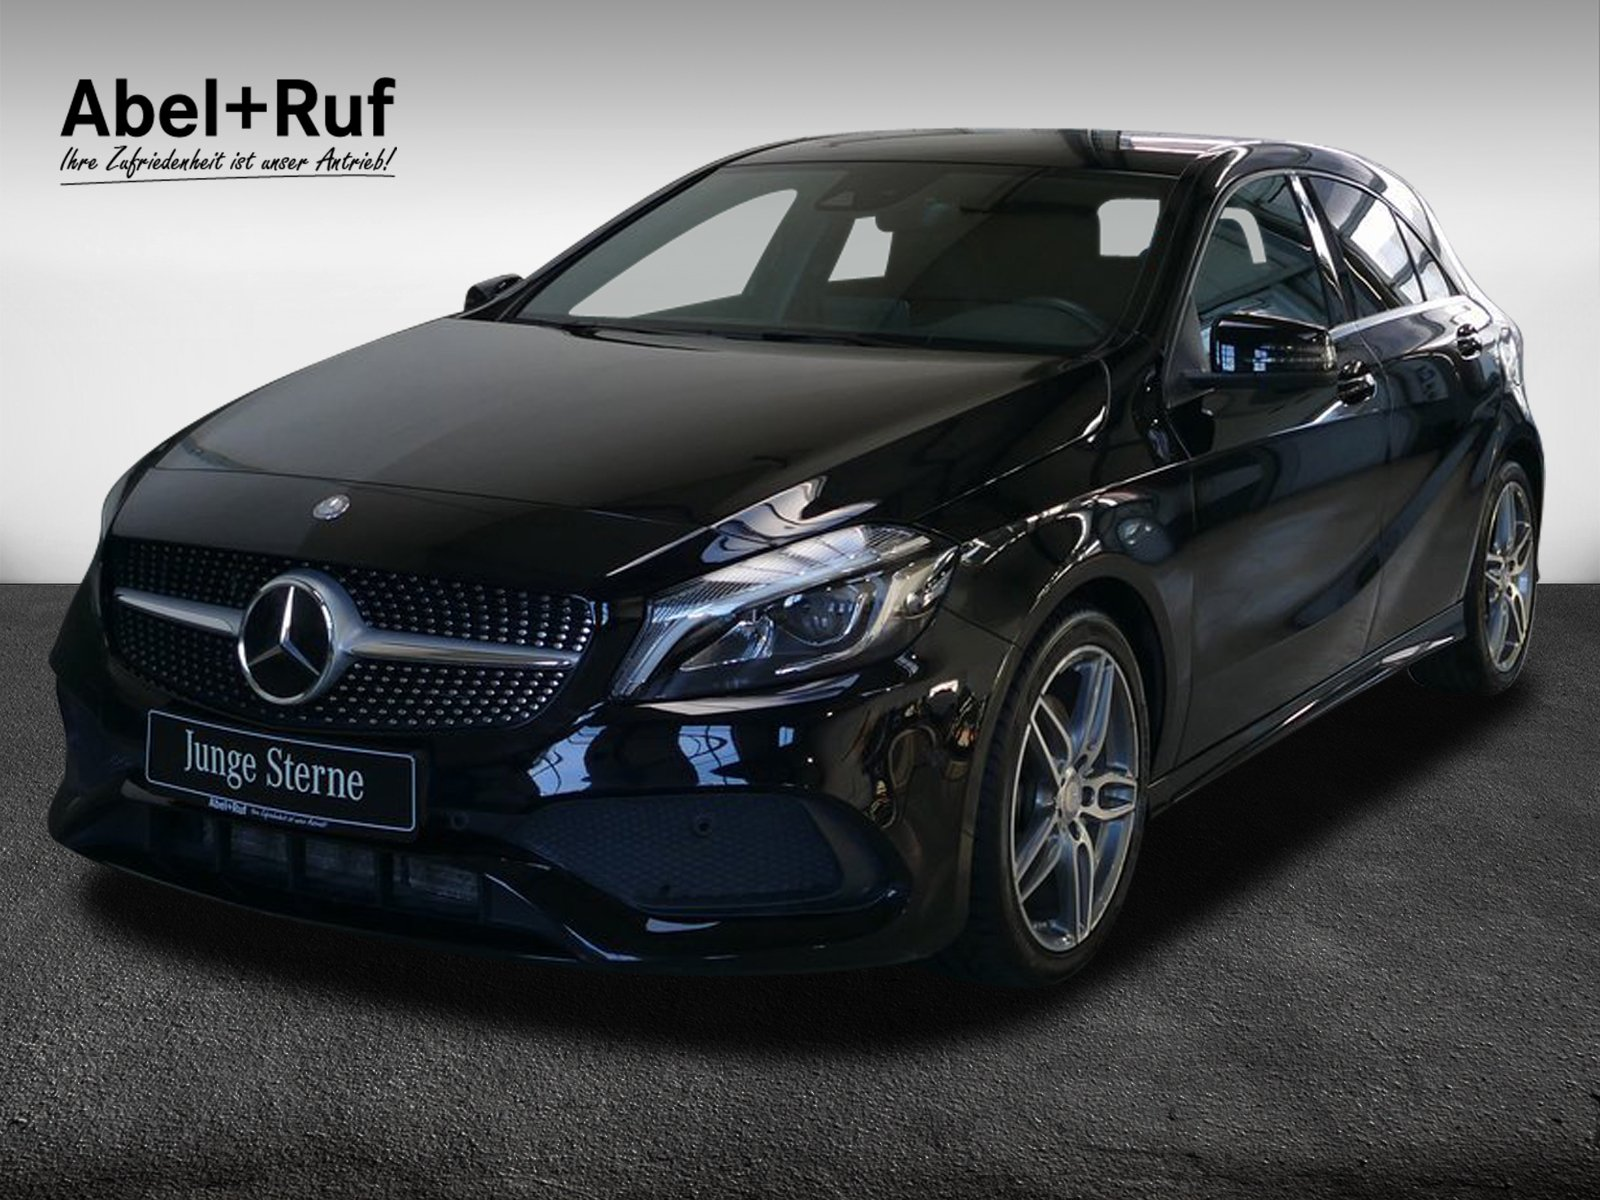 Mercedes-Benz A 220 d AMG+Distronic+Navigation+LED+Kamera+PDC, Jahr 2016, Diesel